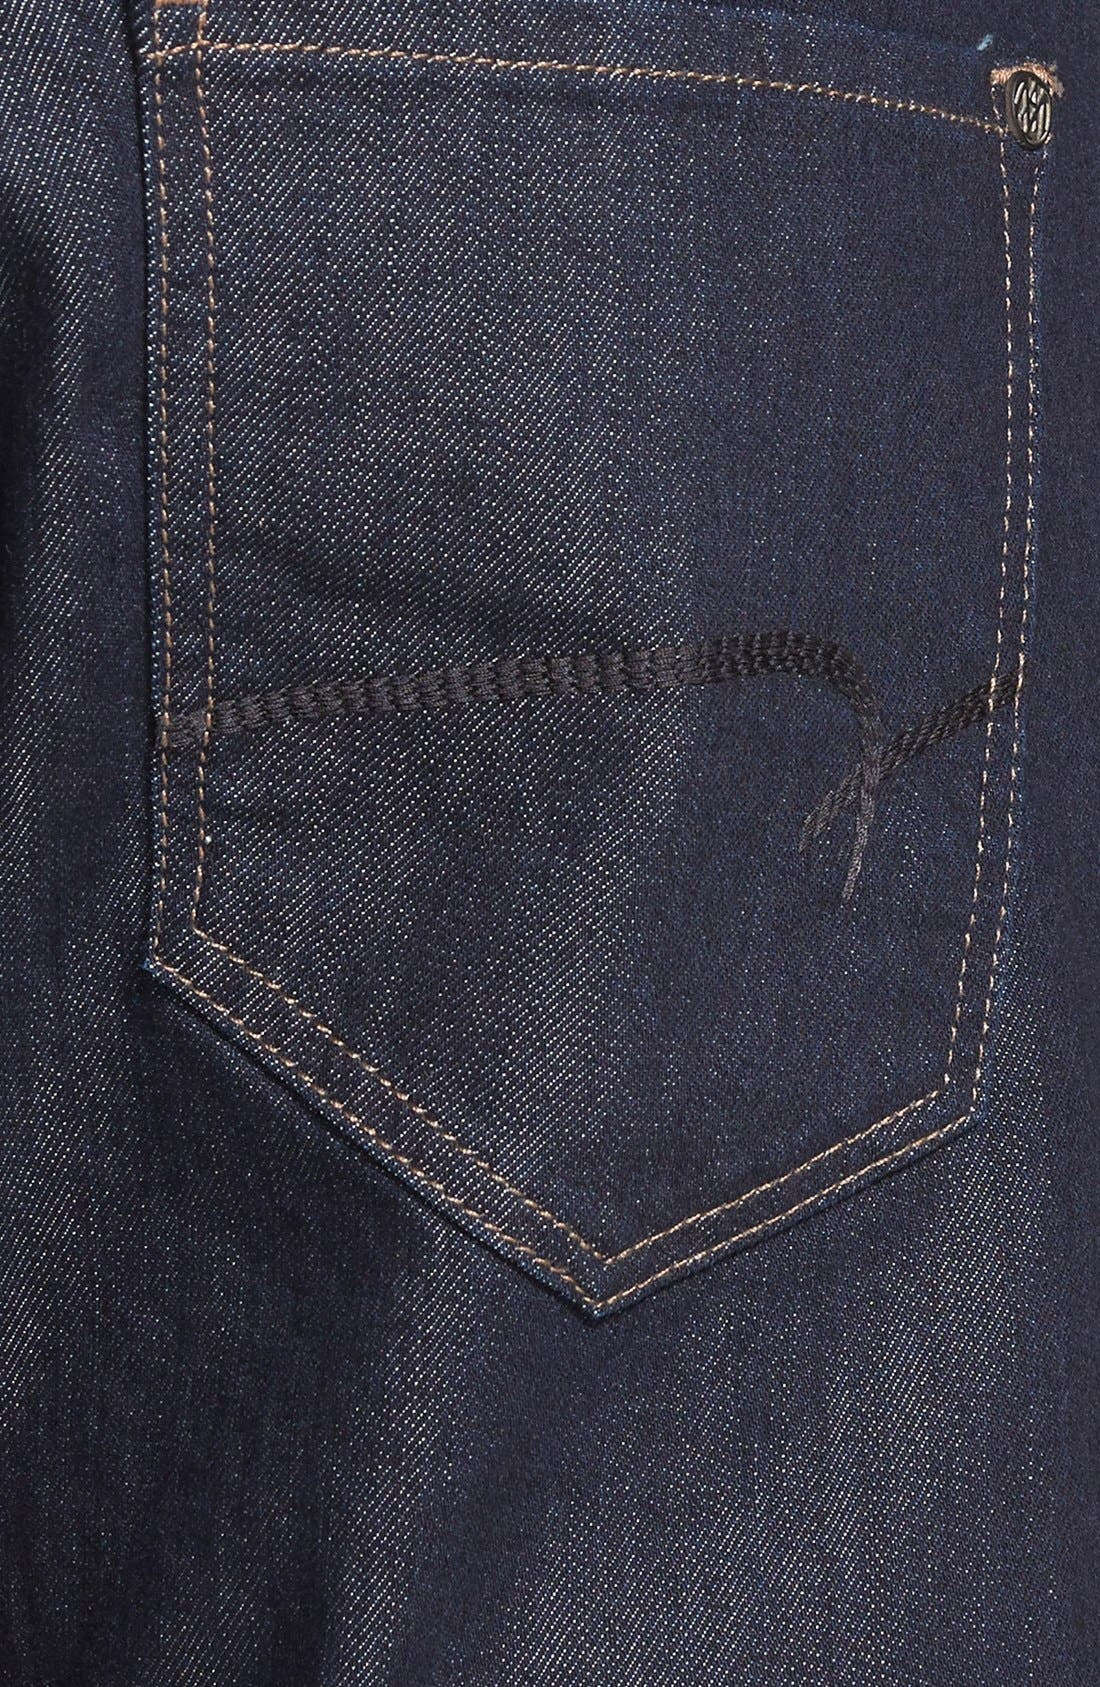 Zach Straight Leg Jeans,                             Alternate thumbnail 5, color,                             RINSE WILLIAMSBURG